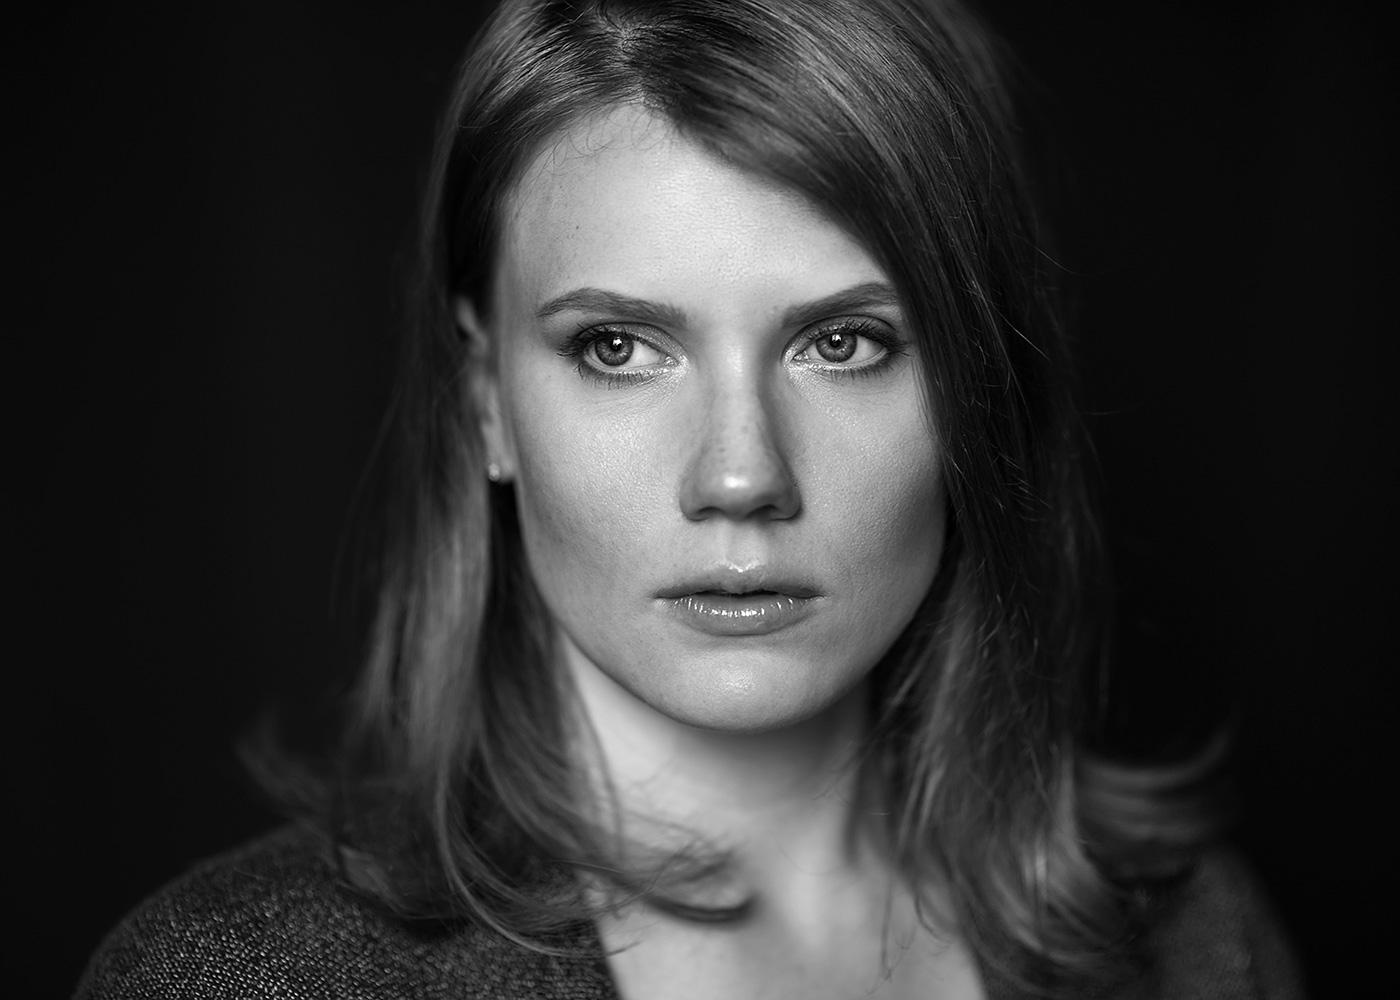 Алла Михайленко(Папка) - актриса театру і кіно